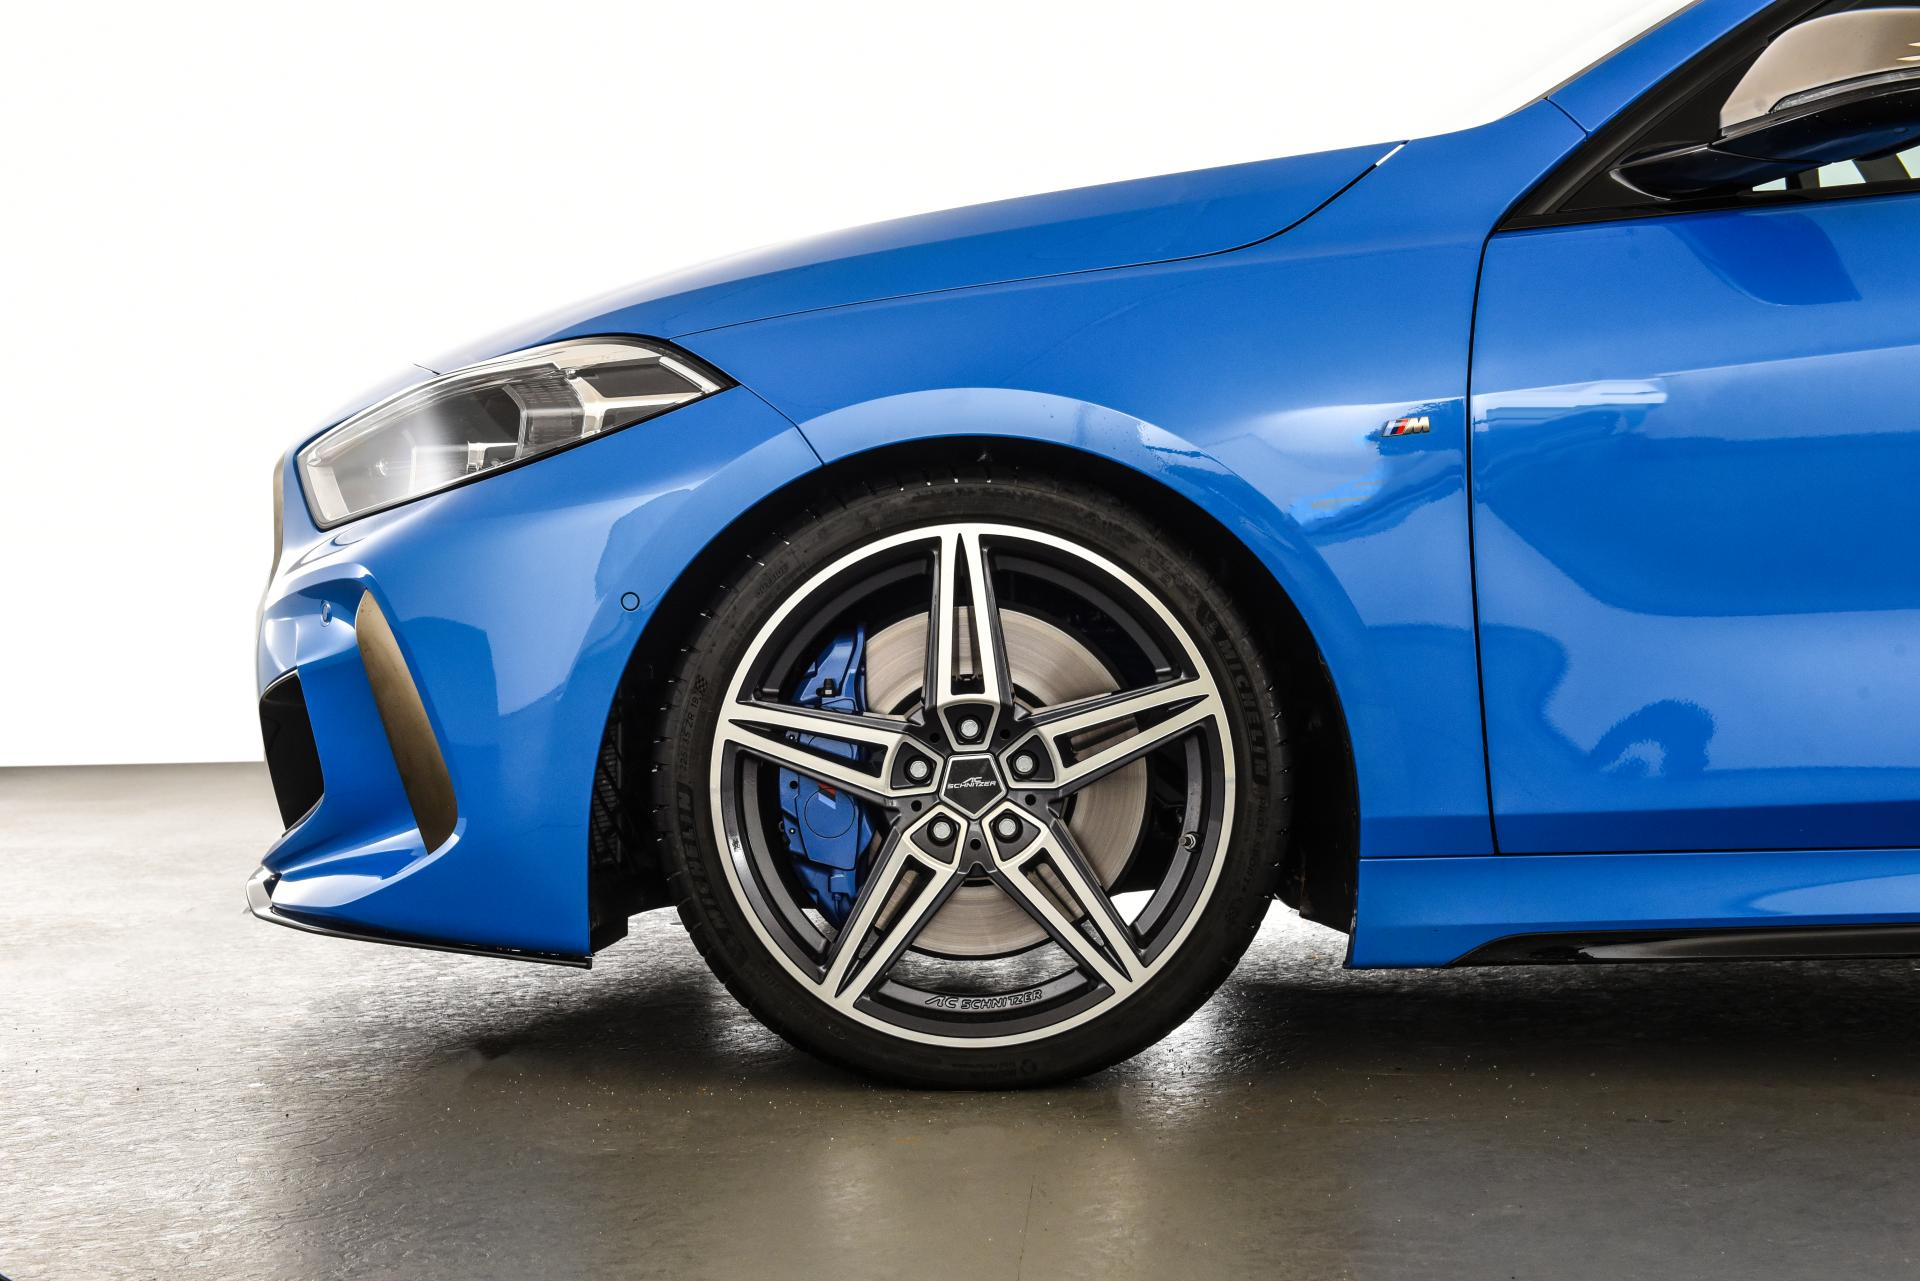 BMW-1-Series-M135i-by-AC-Schnitzer-5